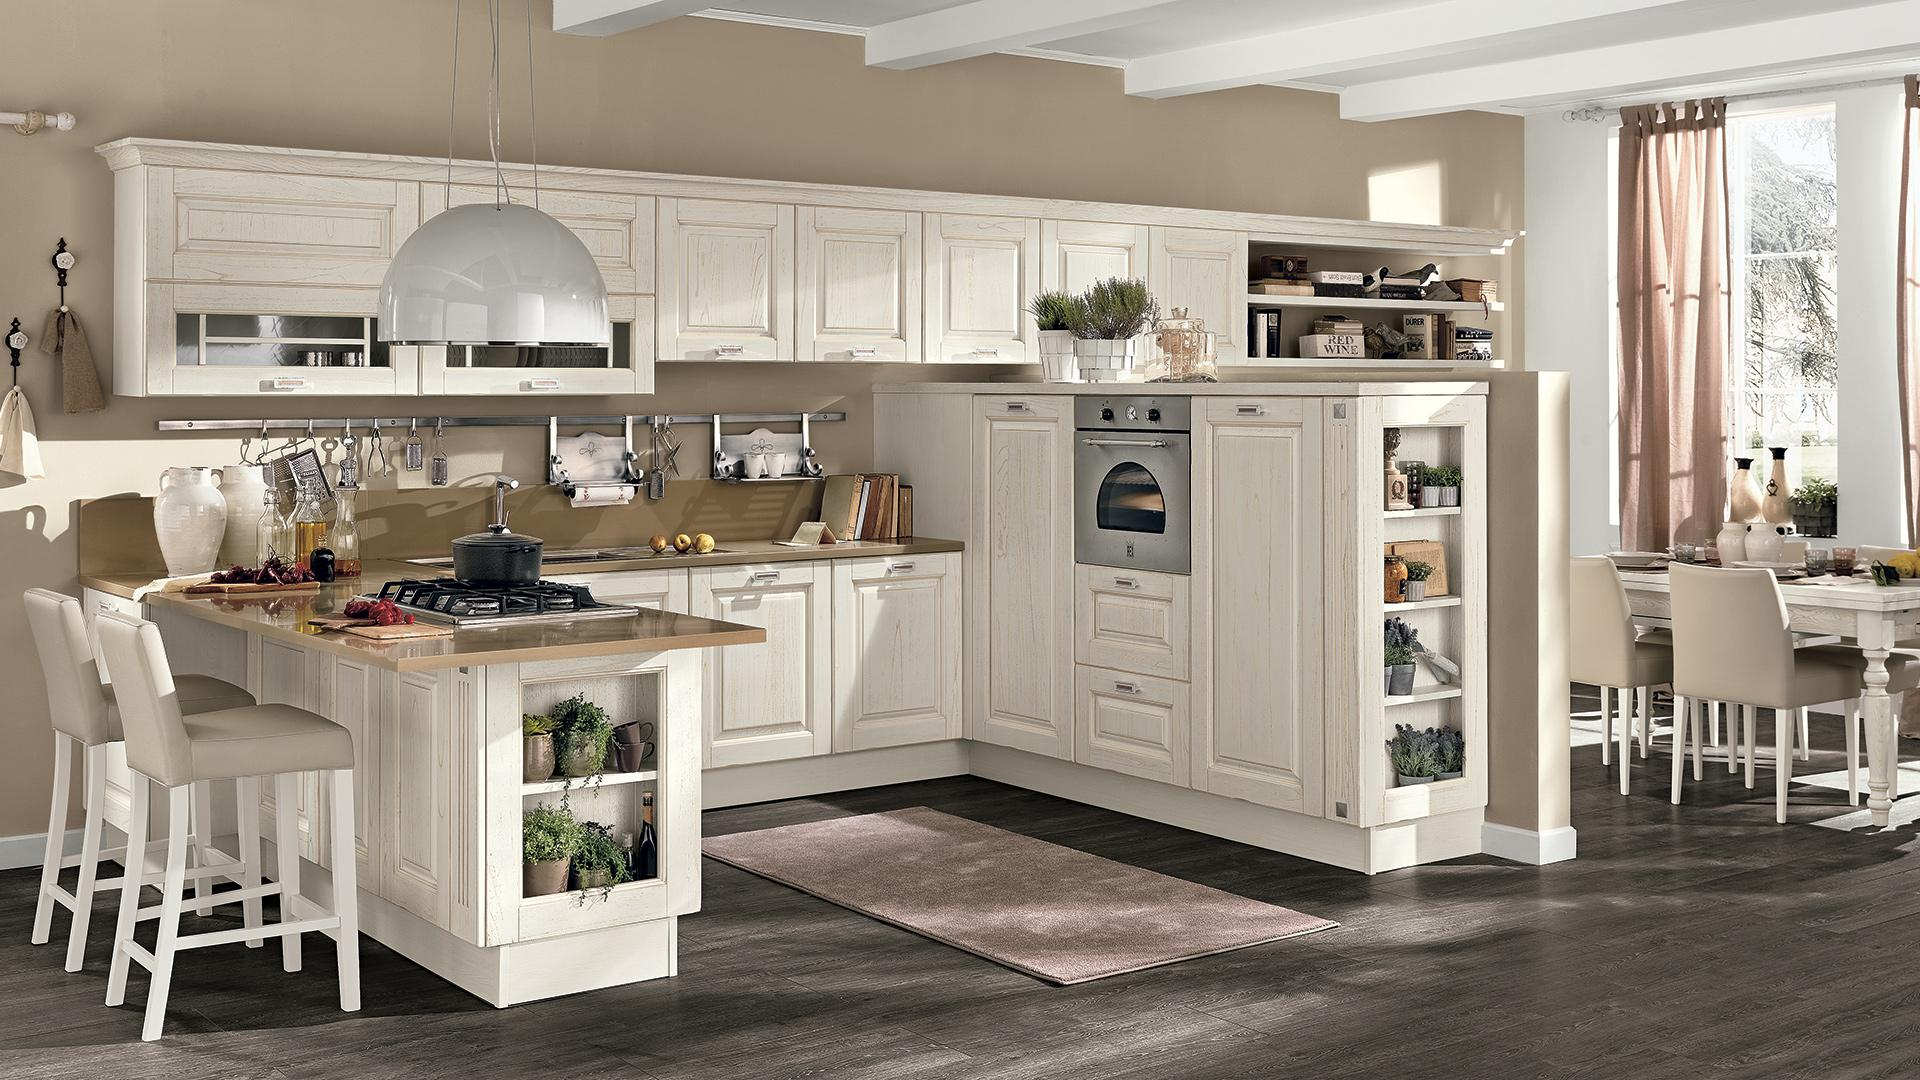 Cucine lube laura arredalcasa - Carrelli per cucine ...